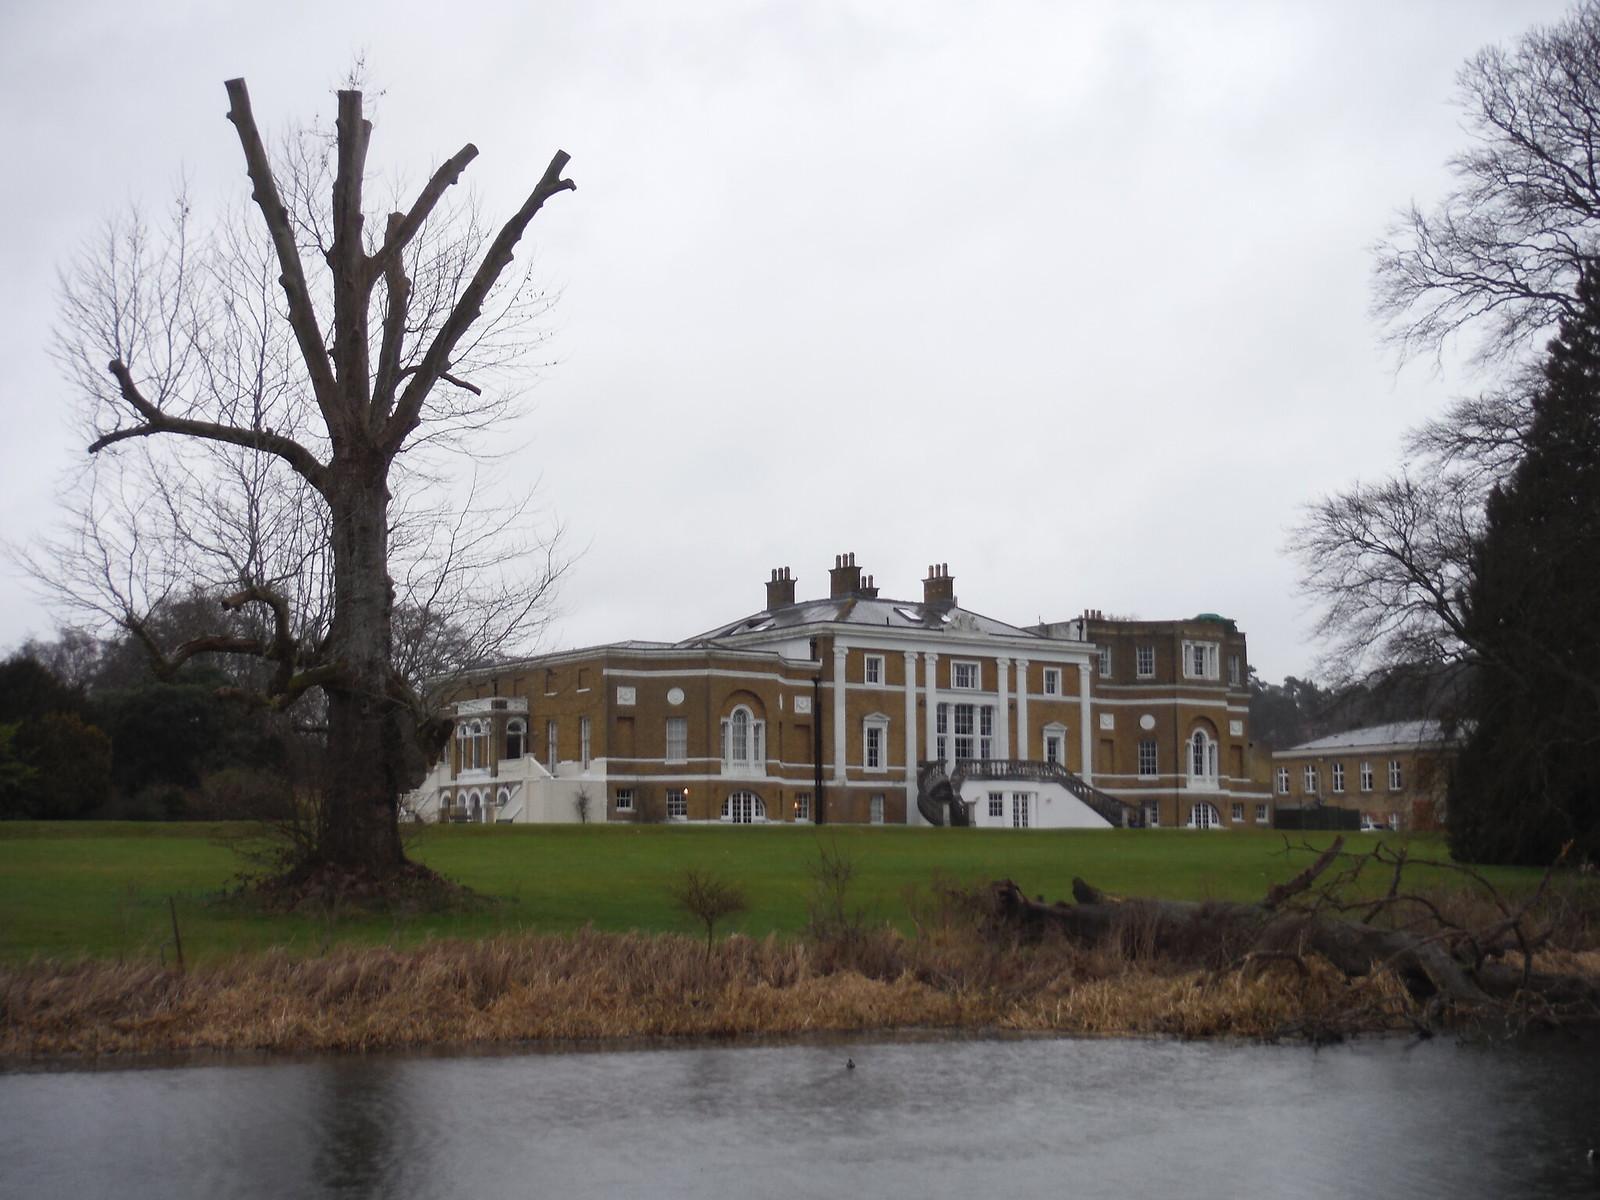 Waverley Abbey House SWC Walk 144 Haslemere to Farnham - Waverley Abbey Extension